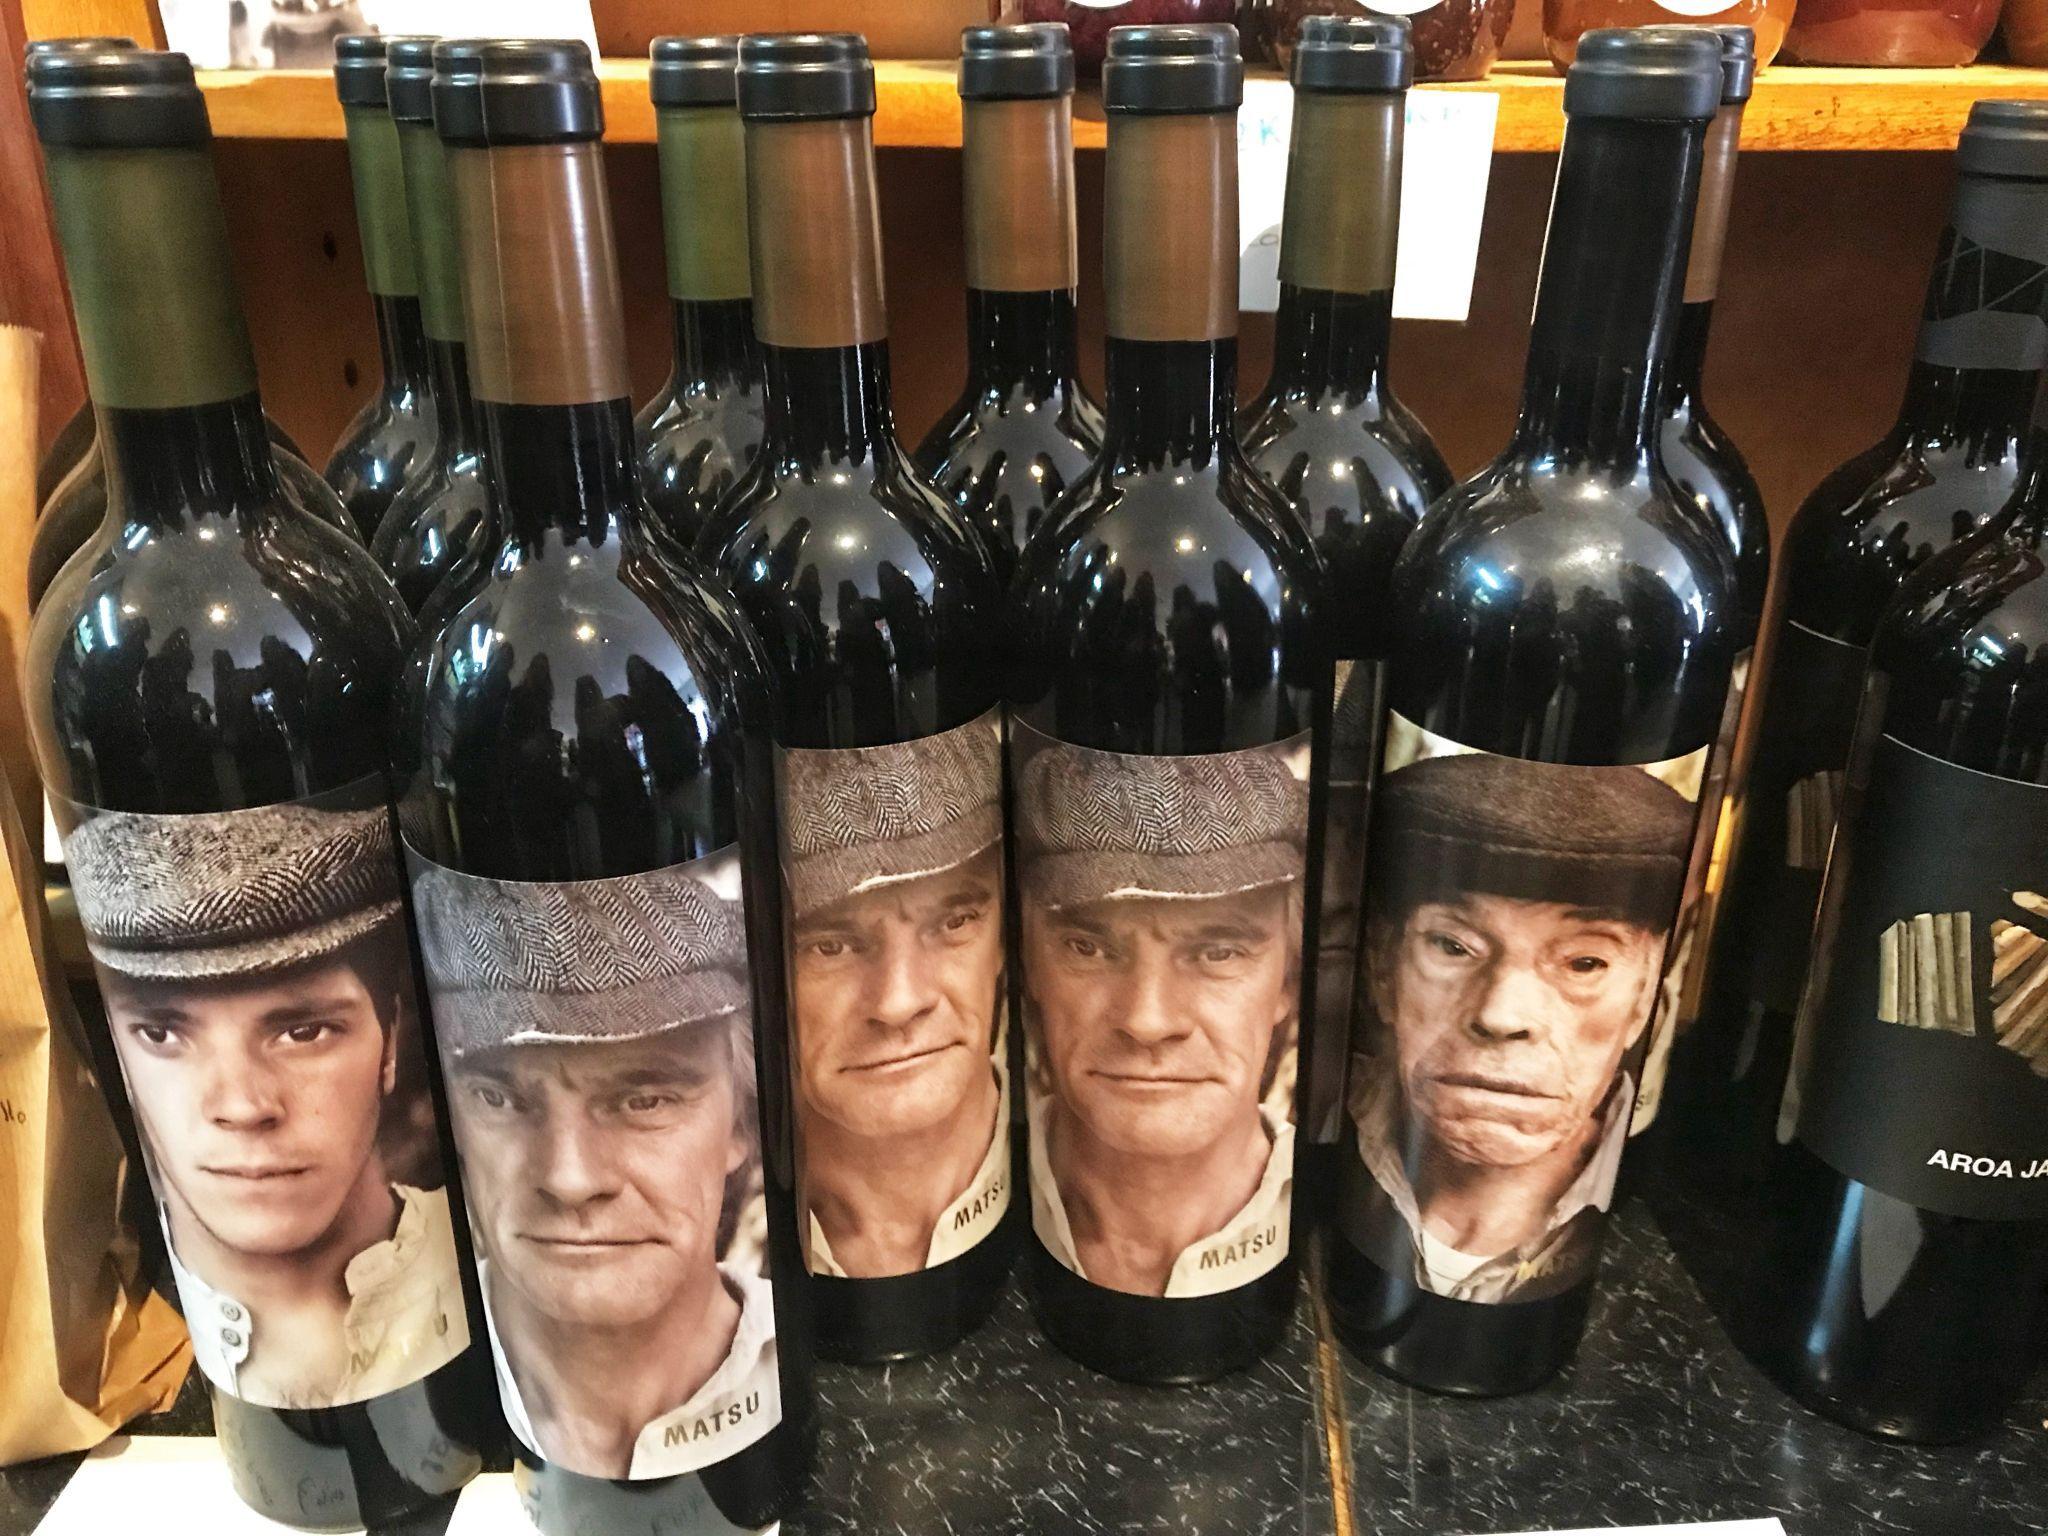 Age of wine determined by the bottle? JokkMokk Eindhoven